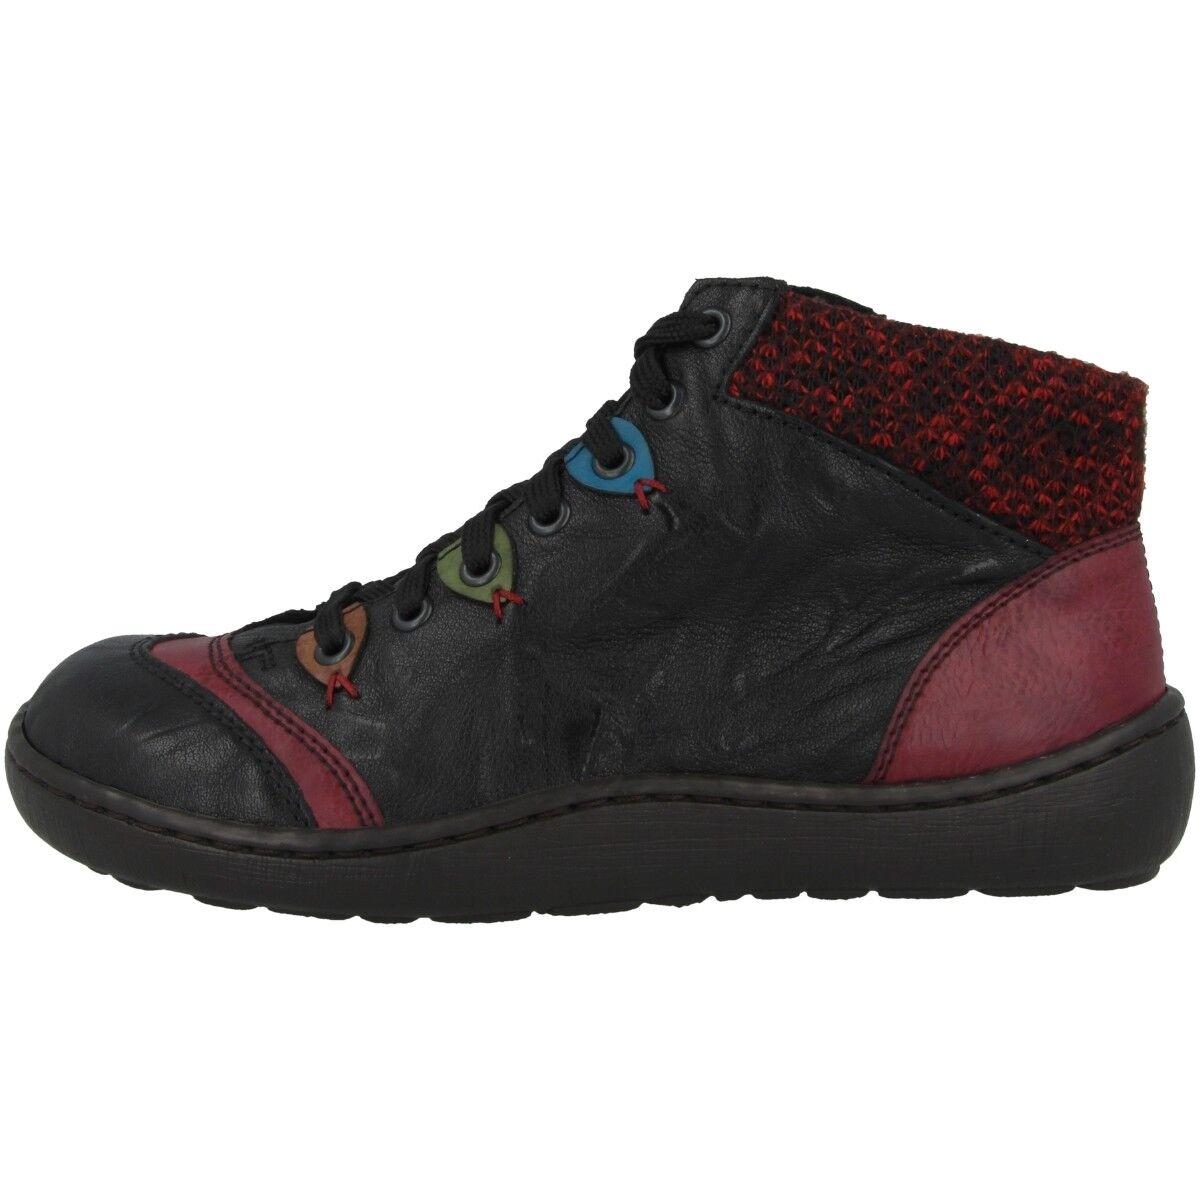 Rieker Massa-Eagle Schuhe Damen Antistress Stiefeletten Turnschuhe schwarz 44430-00